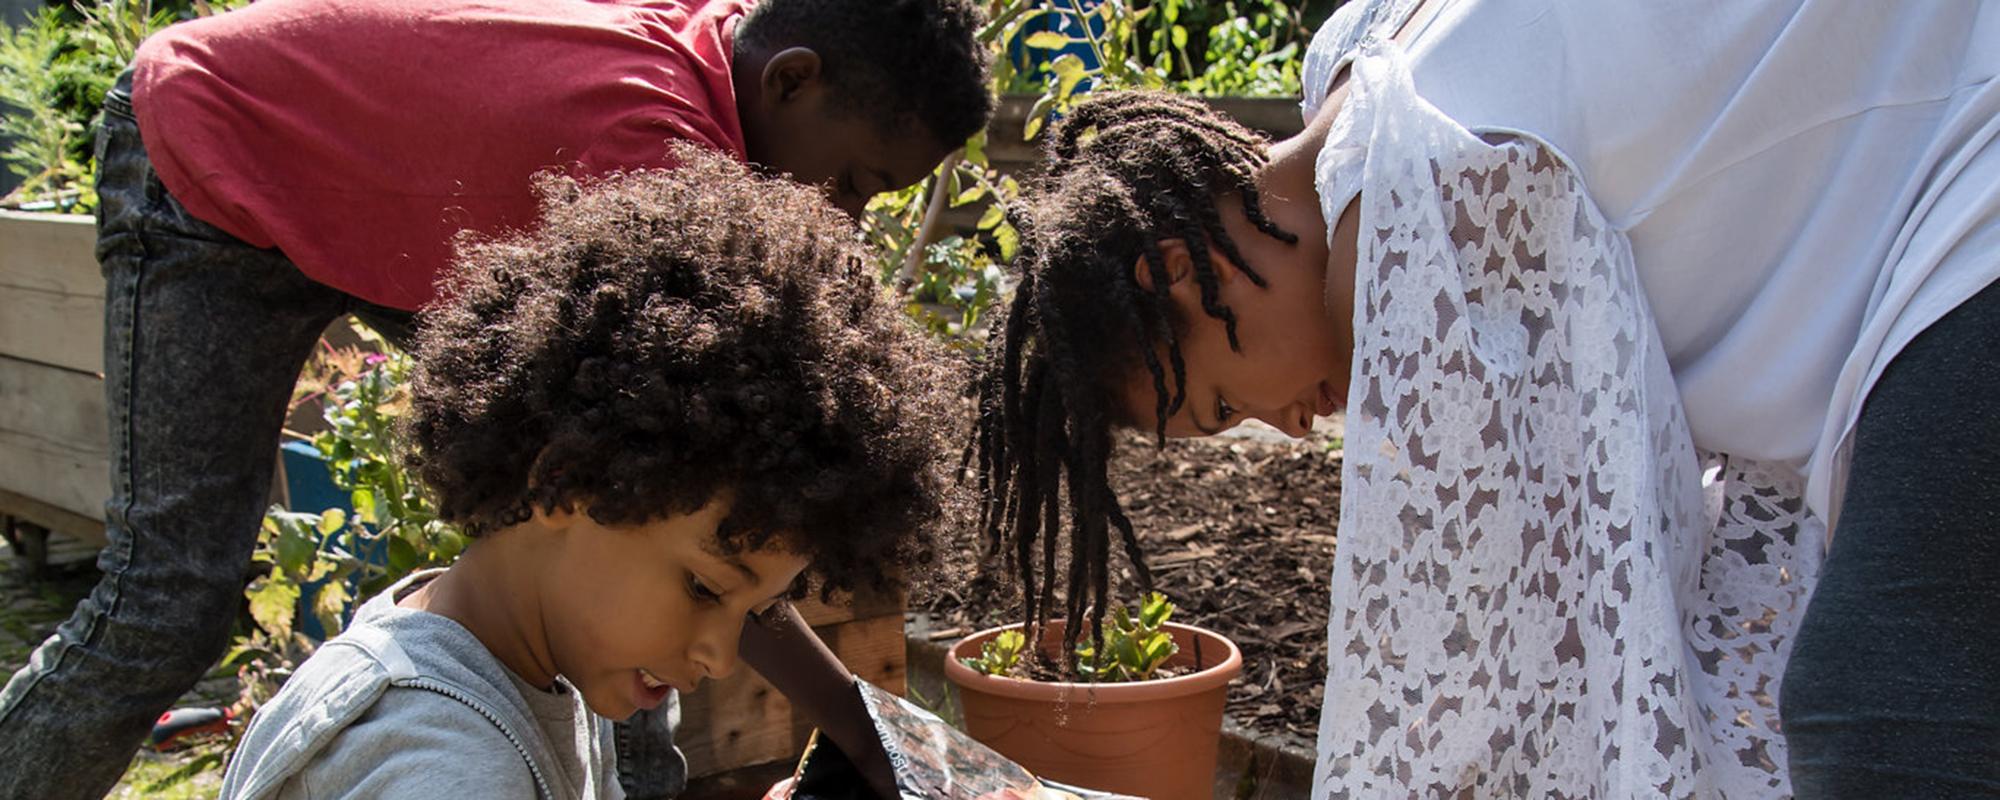 Global Generation Paper Garden outreach